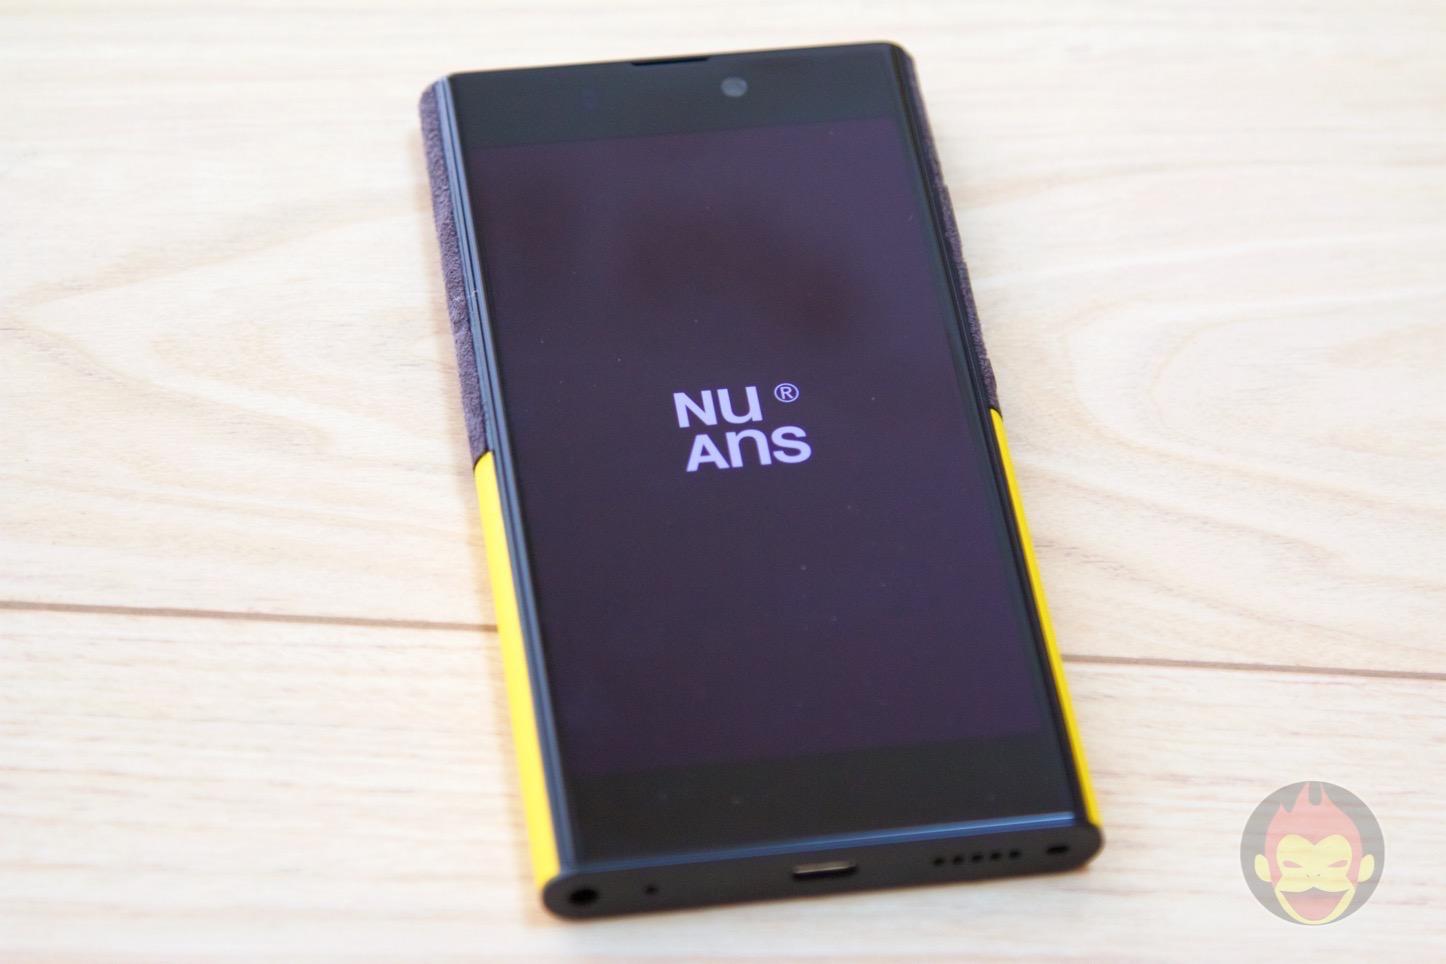 NuAns-Neo-Windows-10-Smartphone-12.jpg